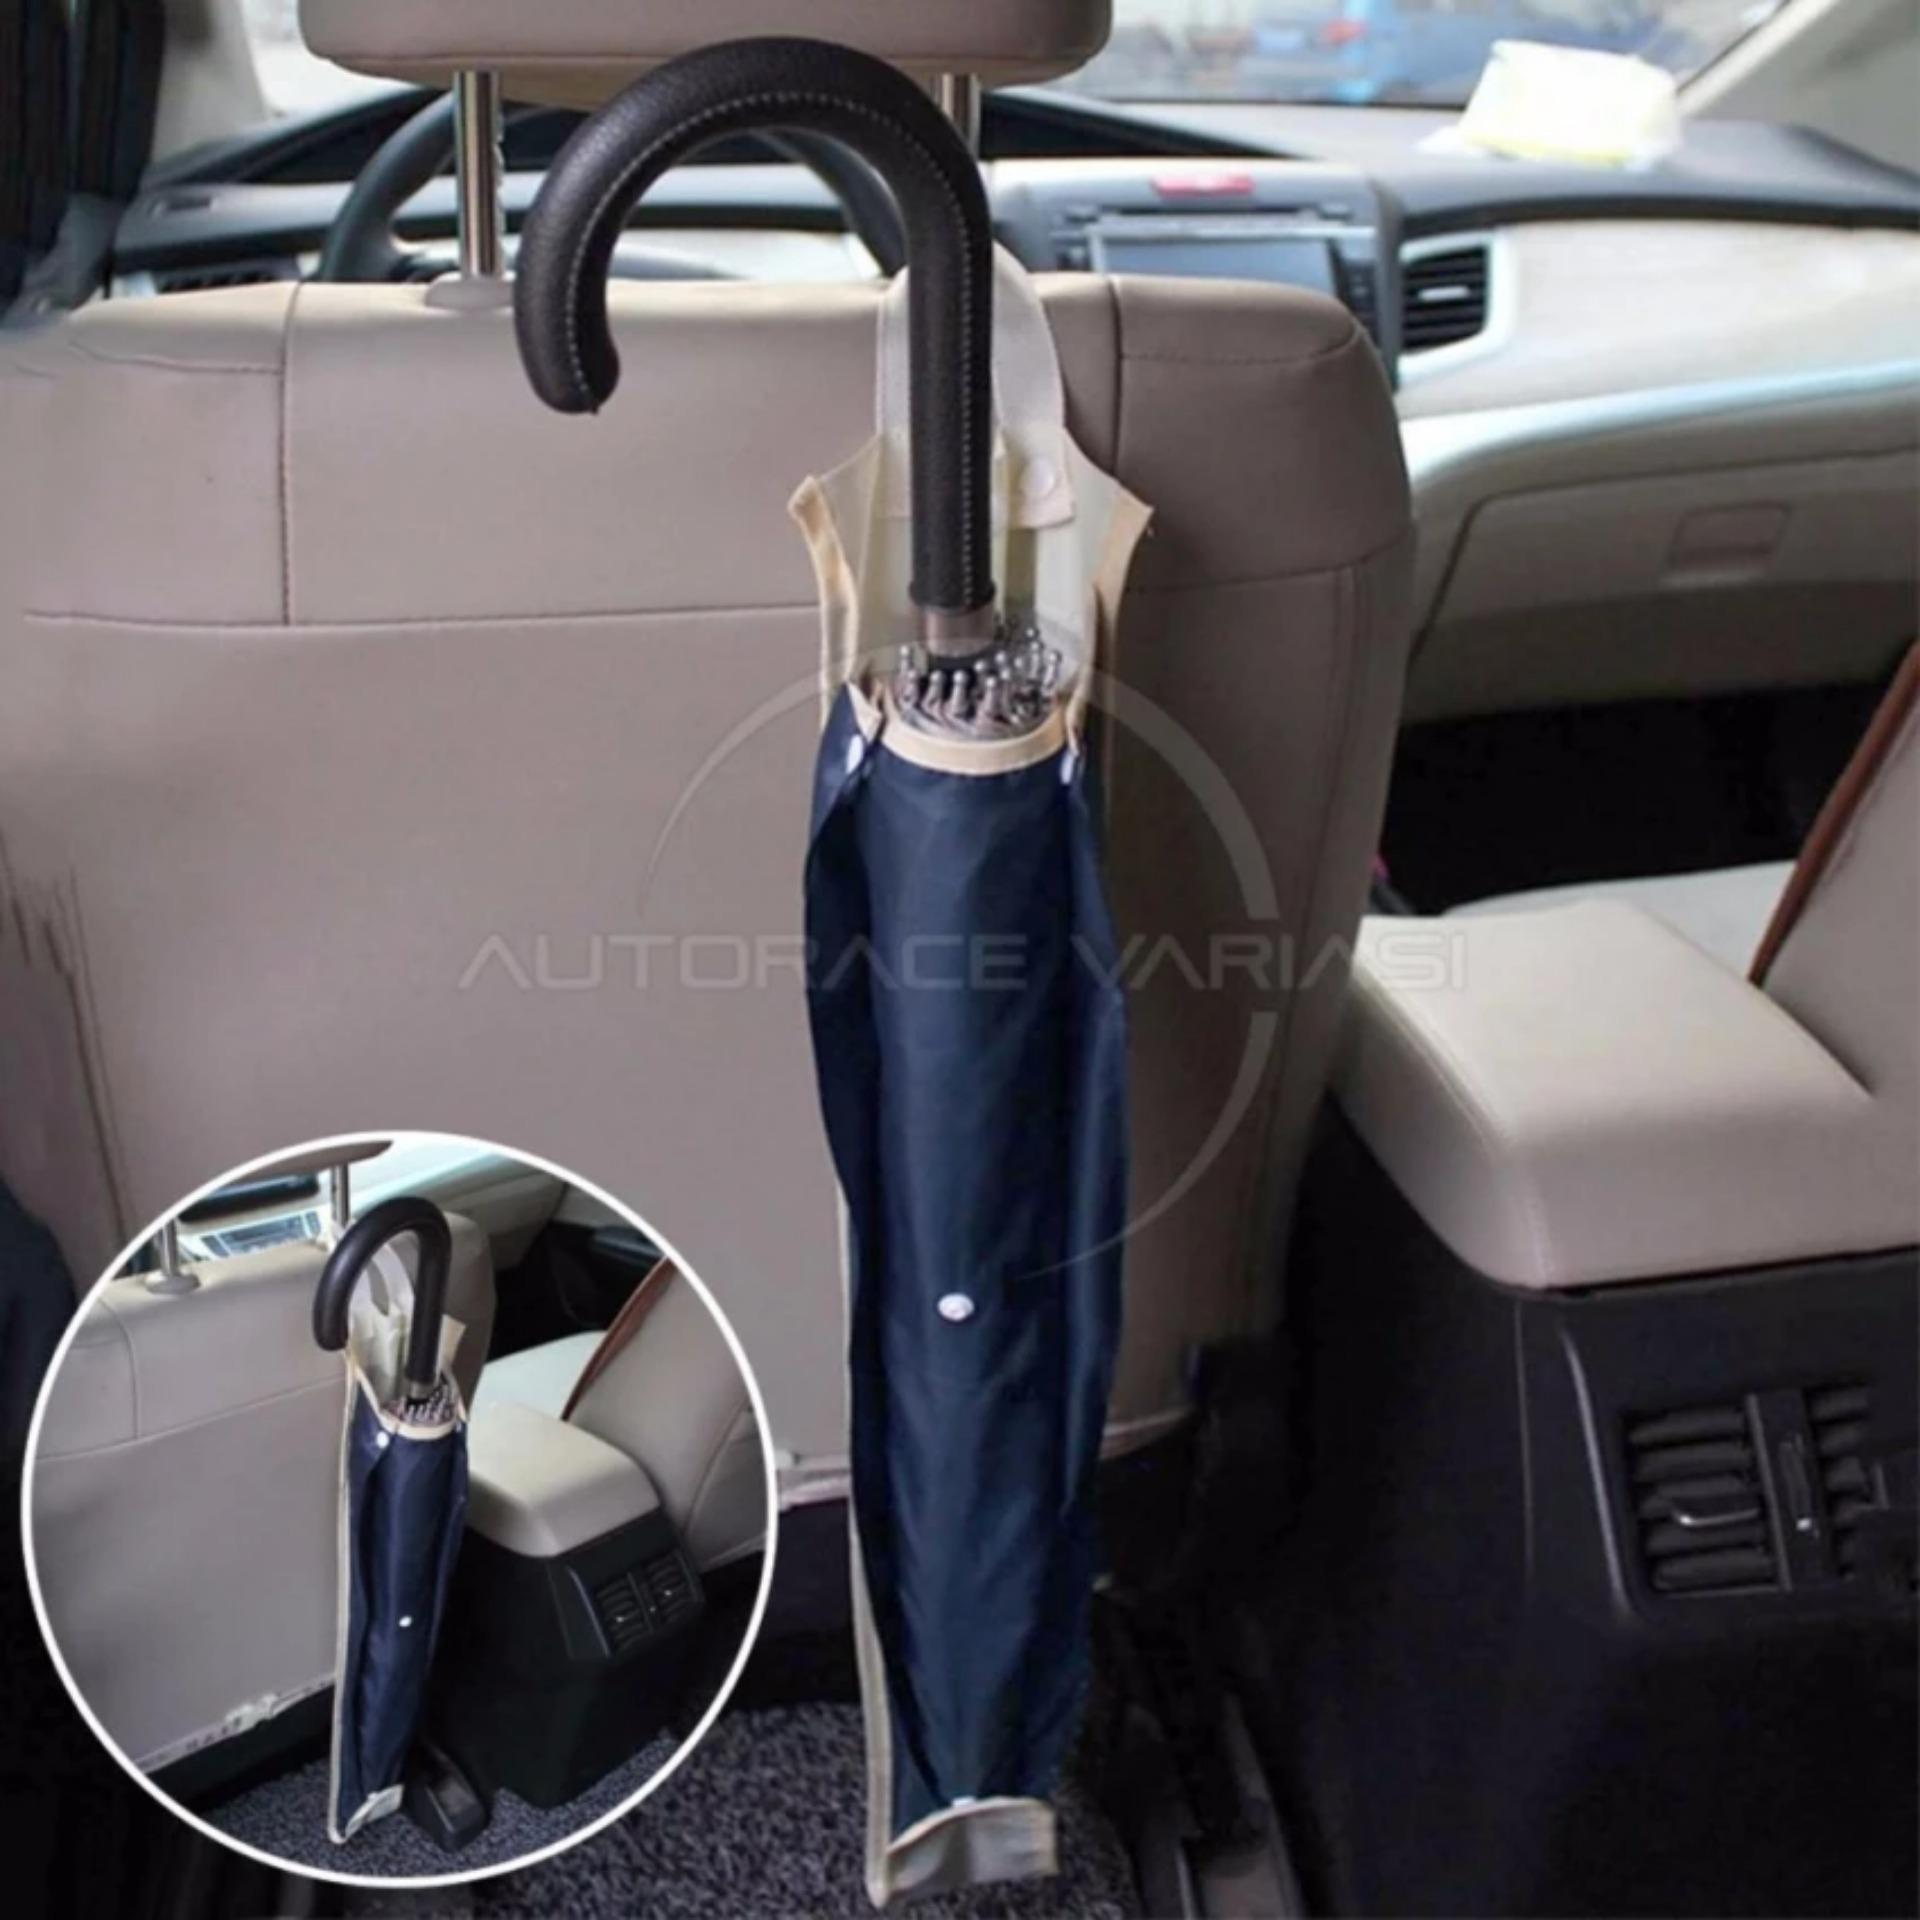 Tempat Penyimpanan Payung MOBIL- Umbrella Organizer CAR